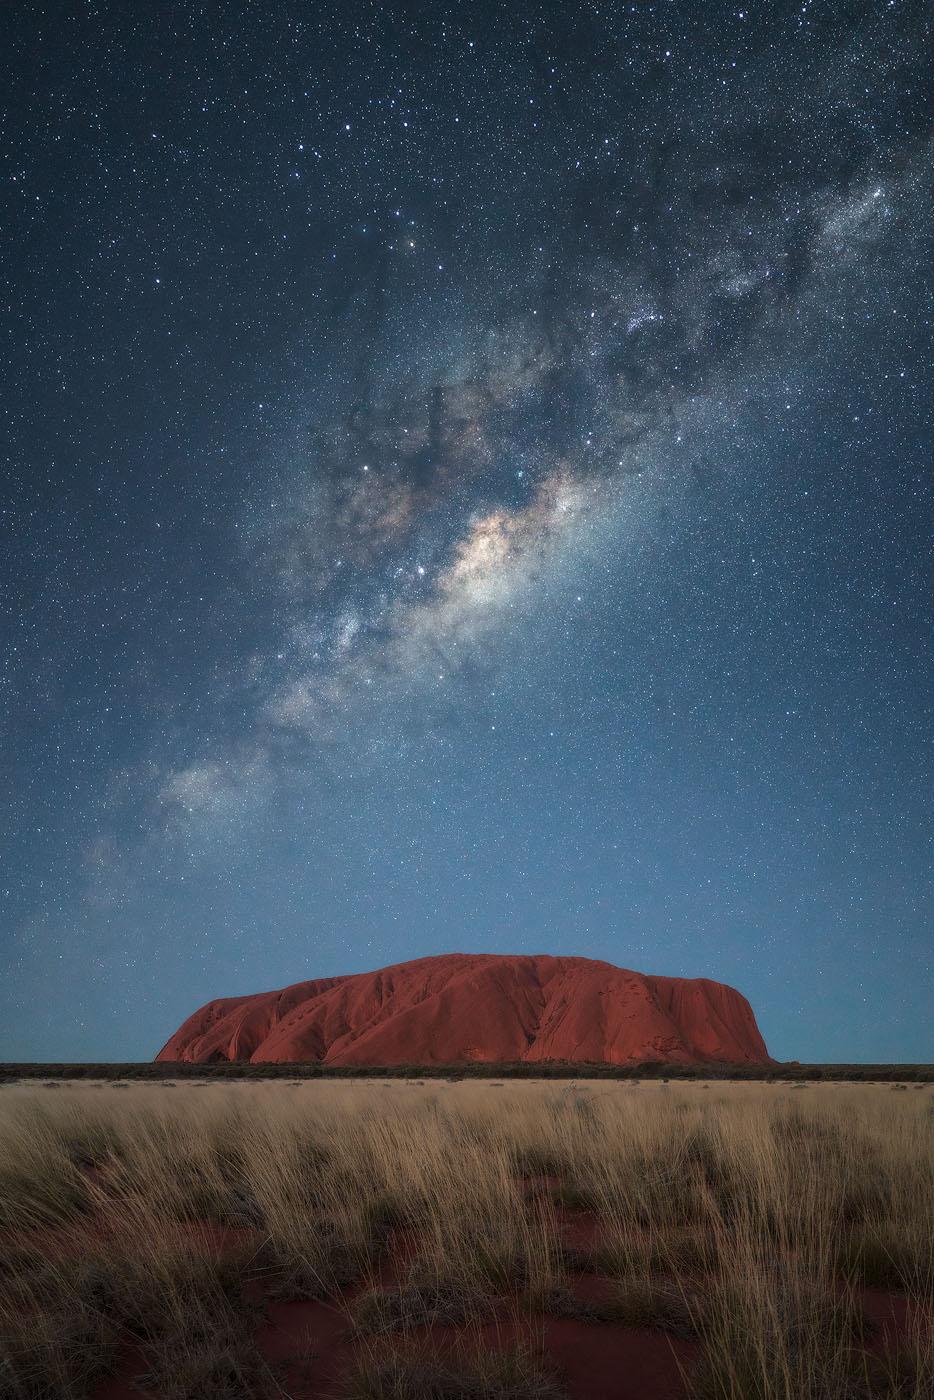 Uluru-Outback-Australia-Stars-Miky-Way.jpg